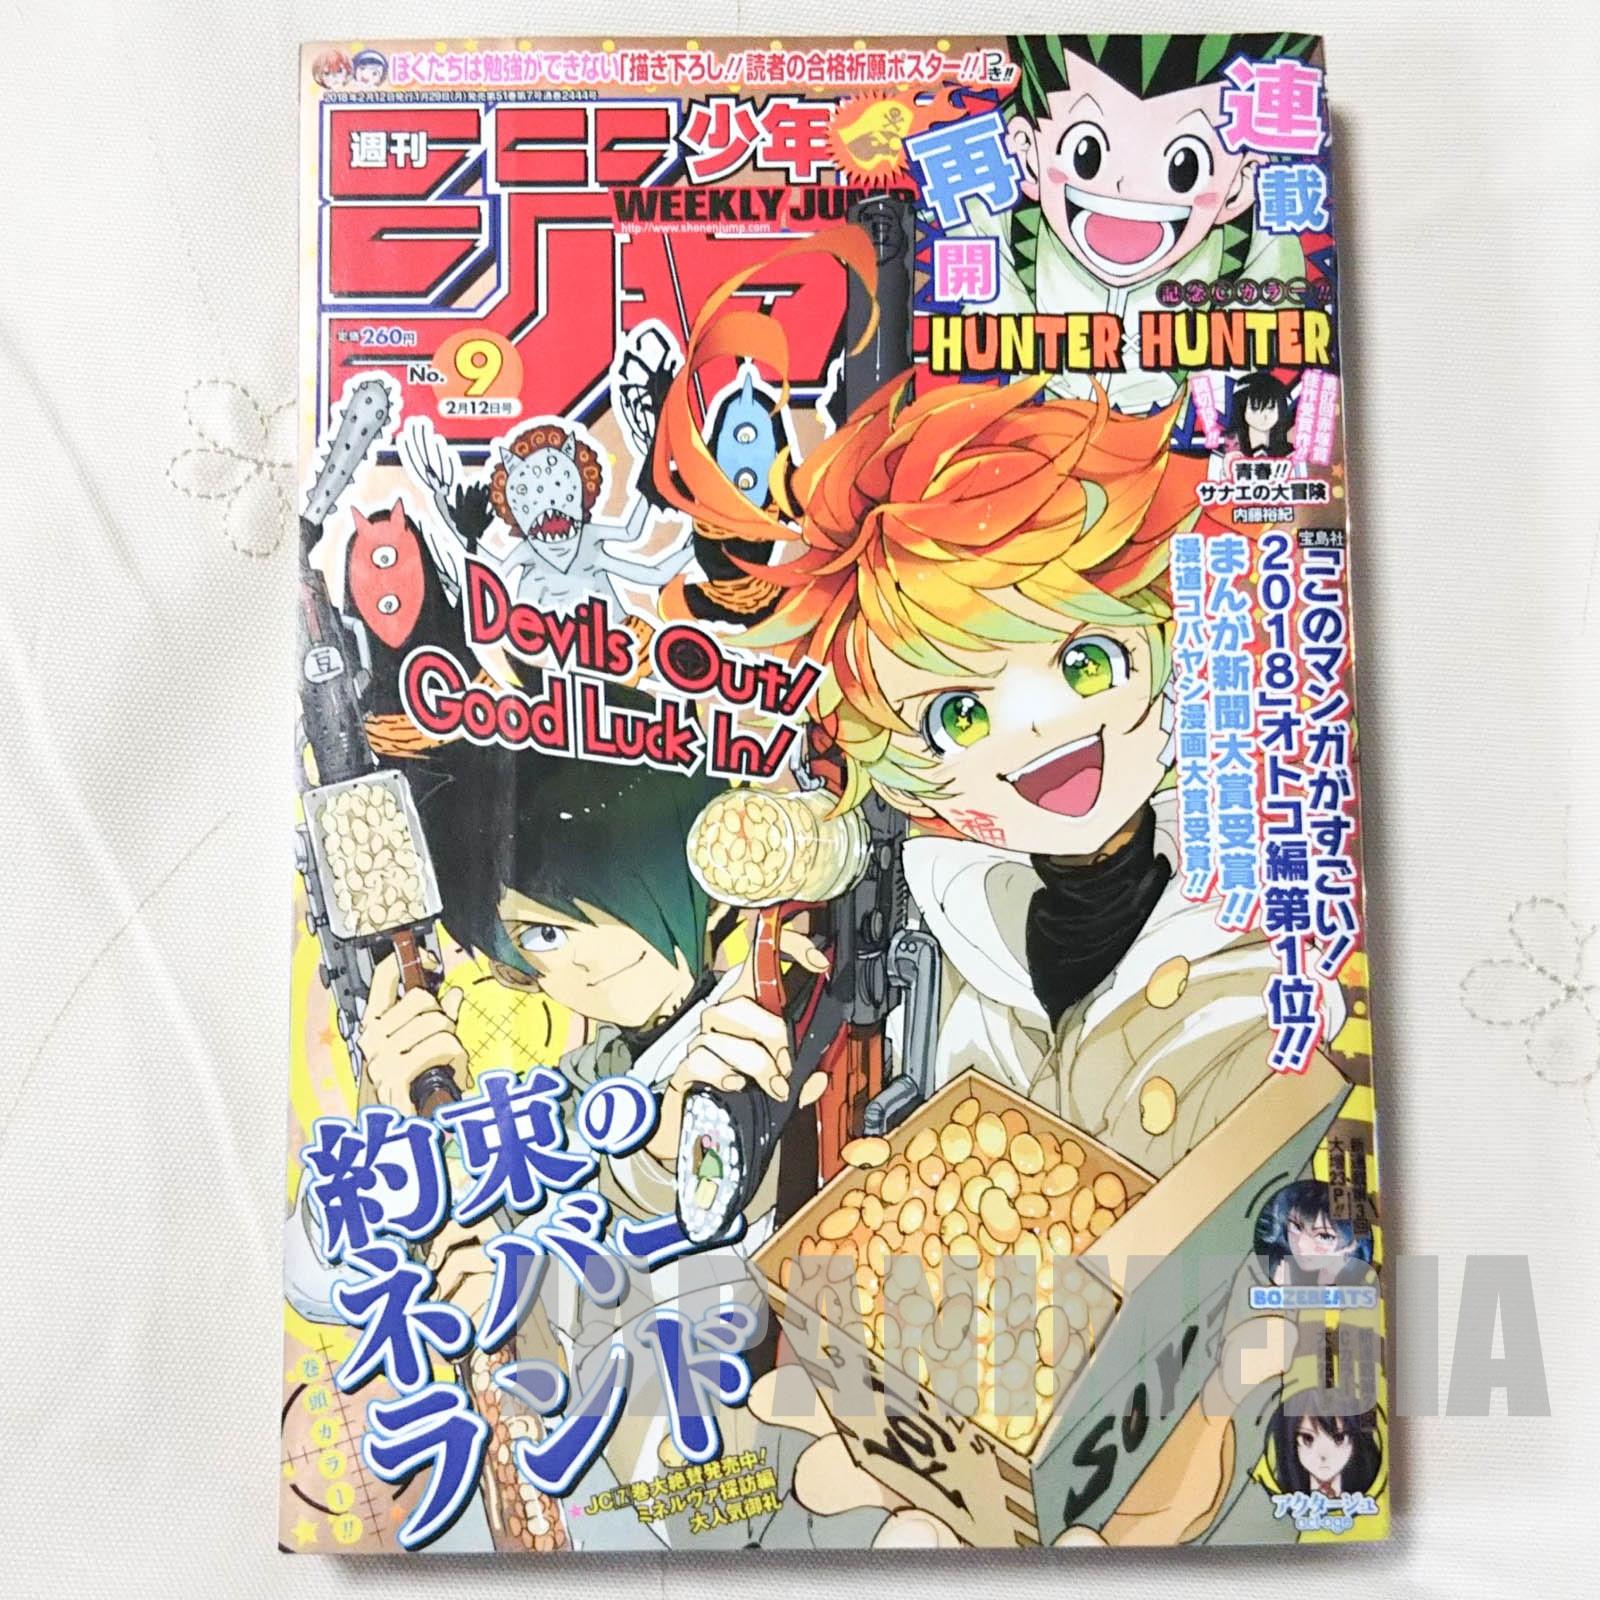 Weekly Shonen JUMP Vol.09 2018 The Promised Neverland / Japanese Magazine JAPAN MANGA